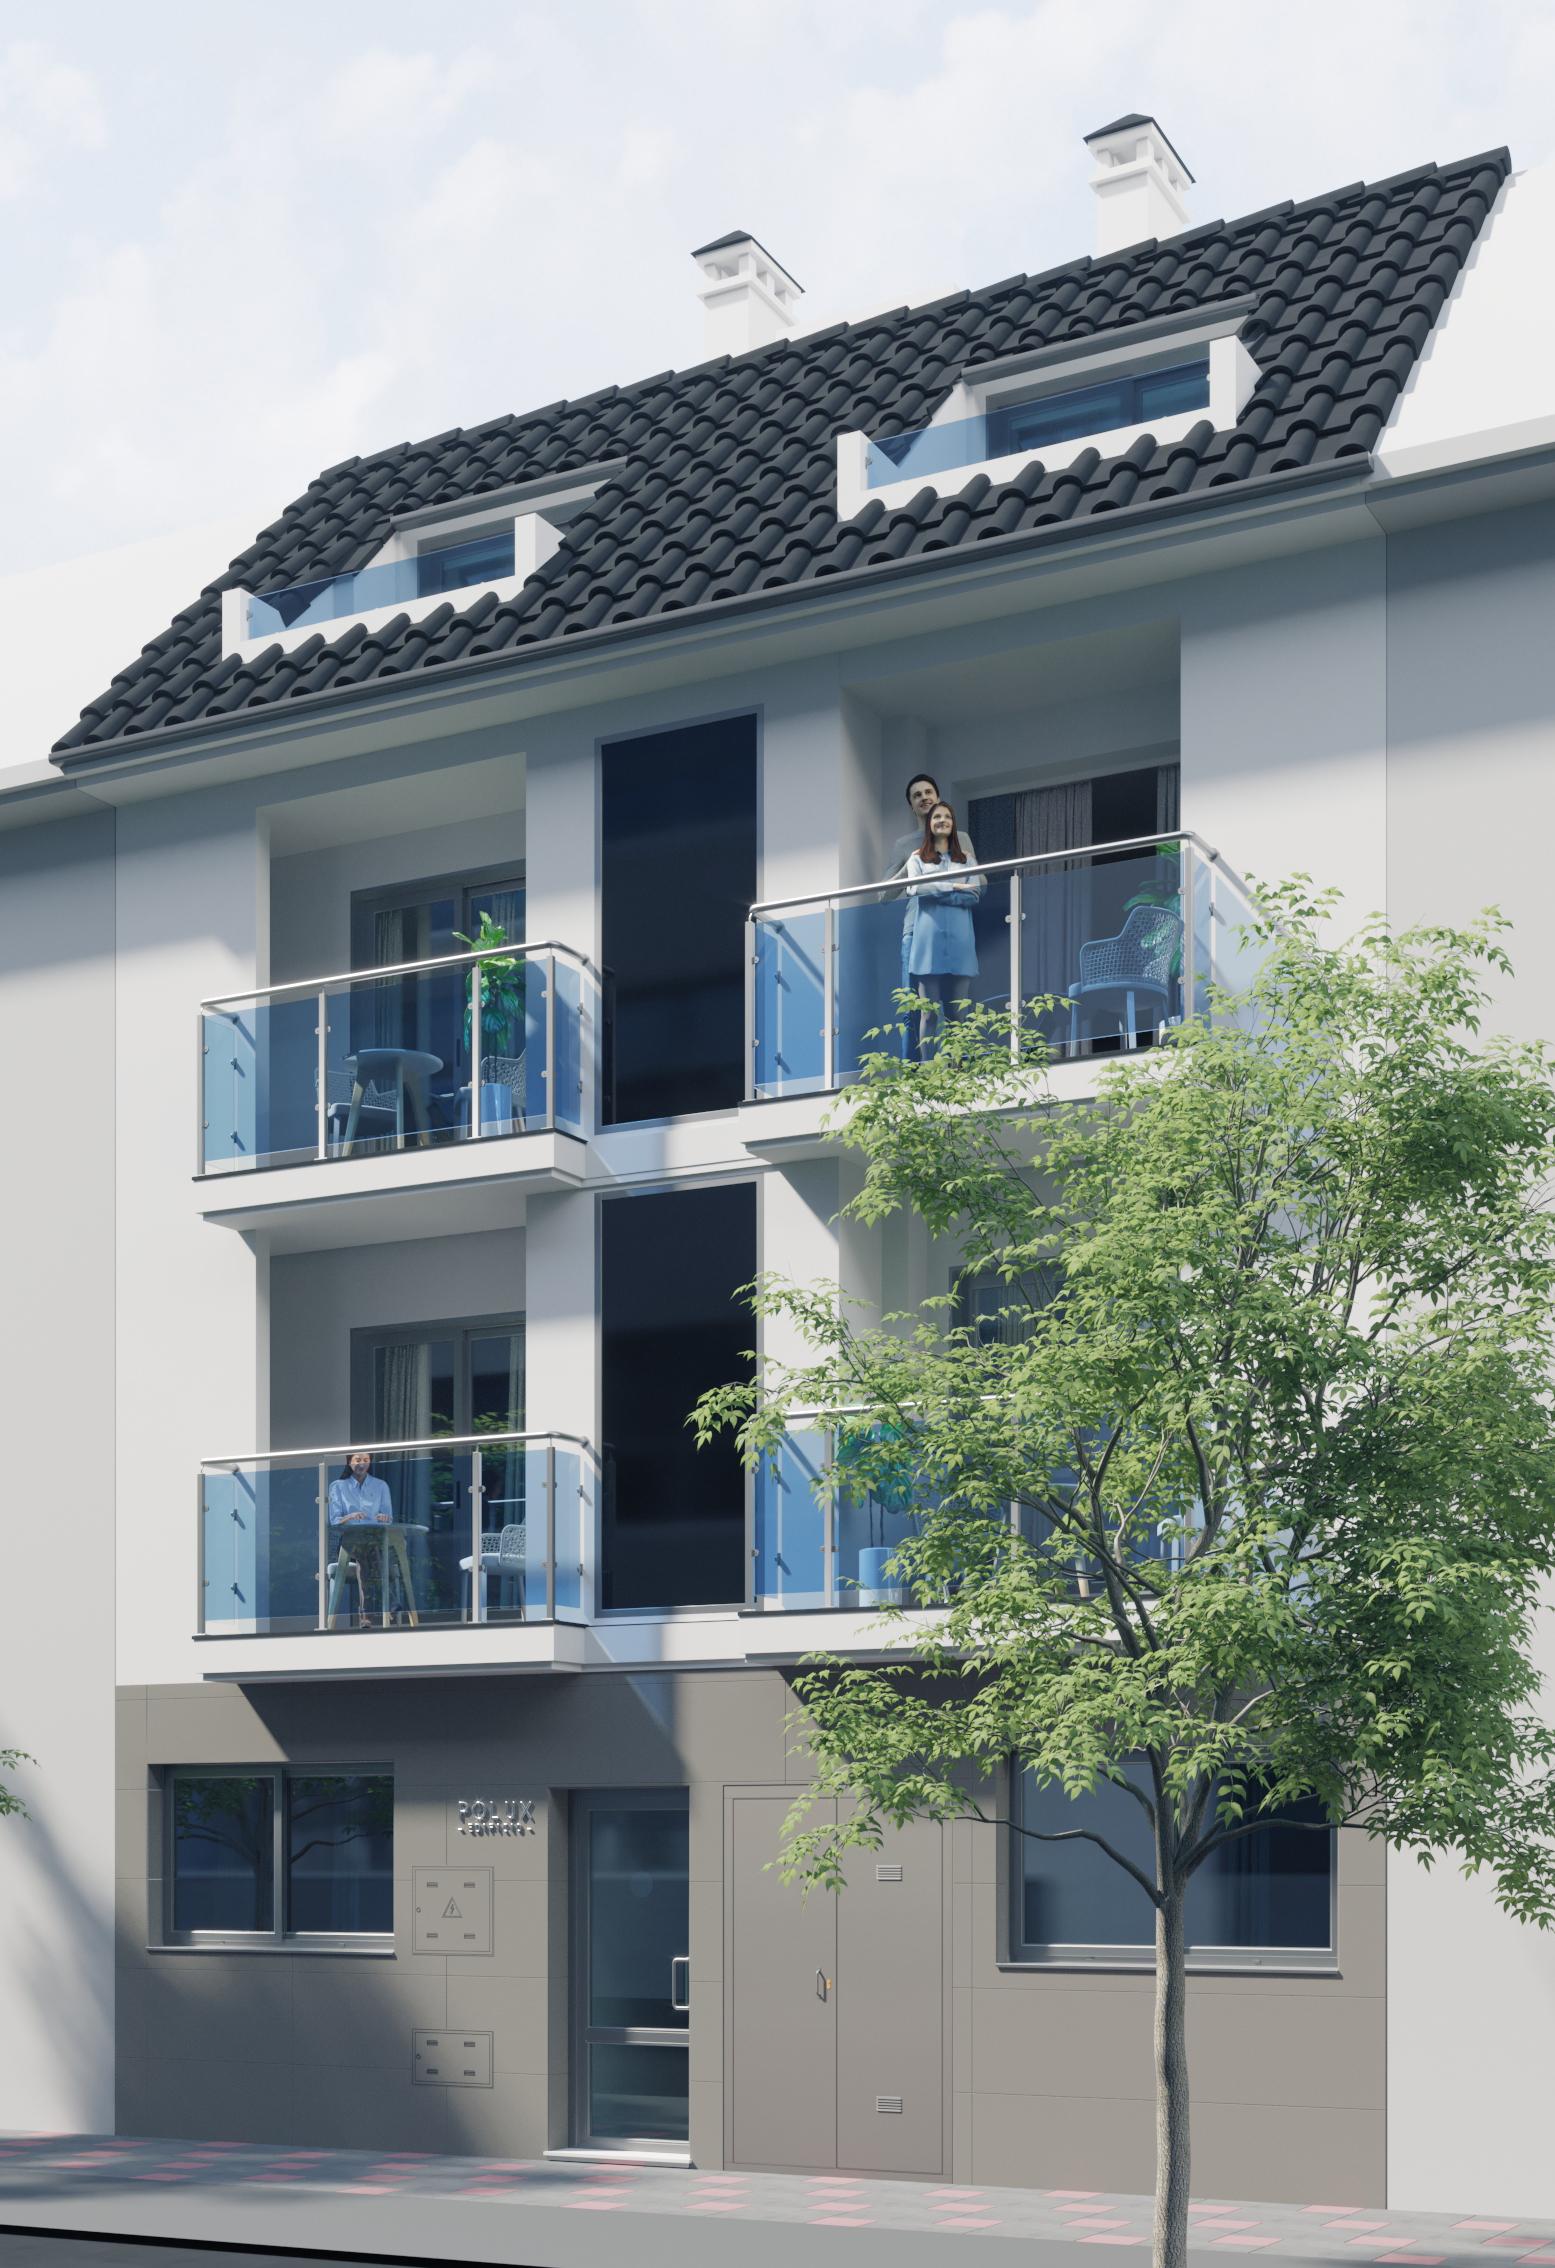 2, 2 Bedrooms Bedrooms, ,1 BathroomBathrooms,Apartment,For Sale,1131